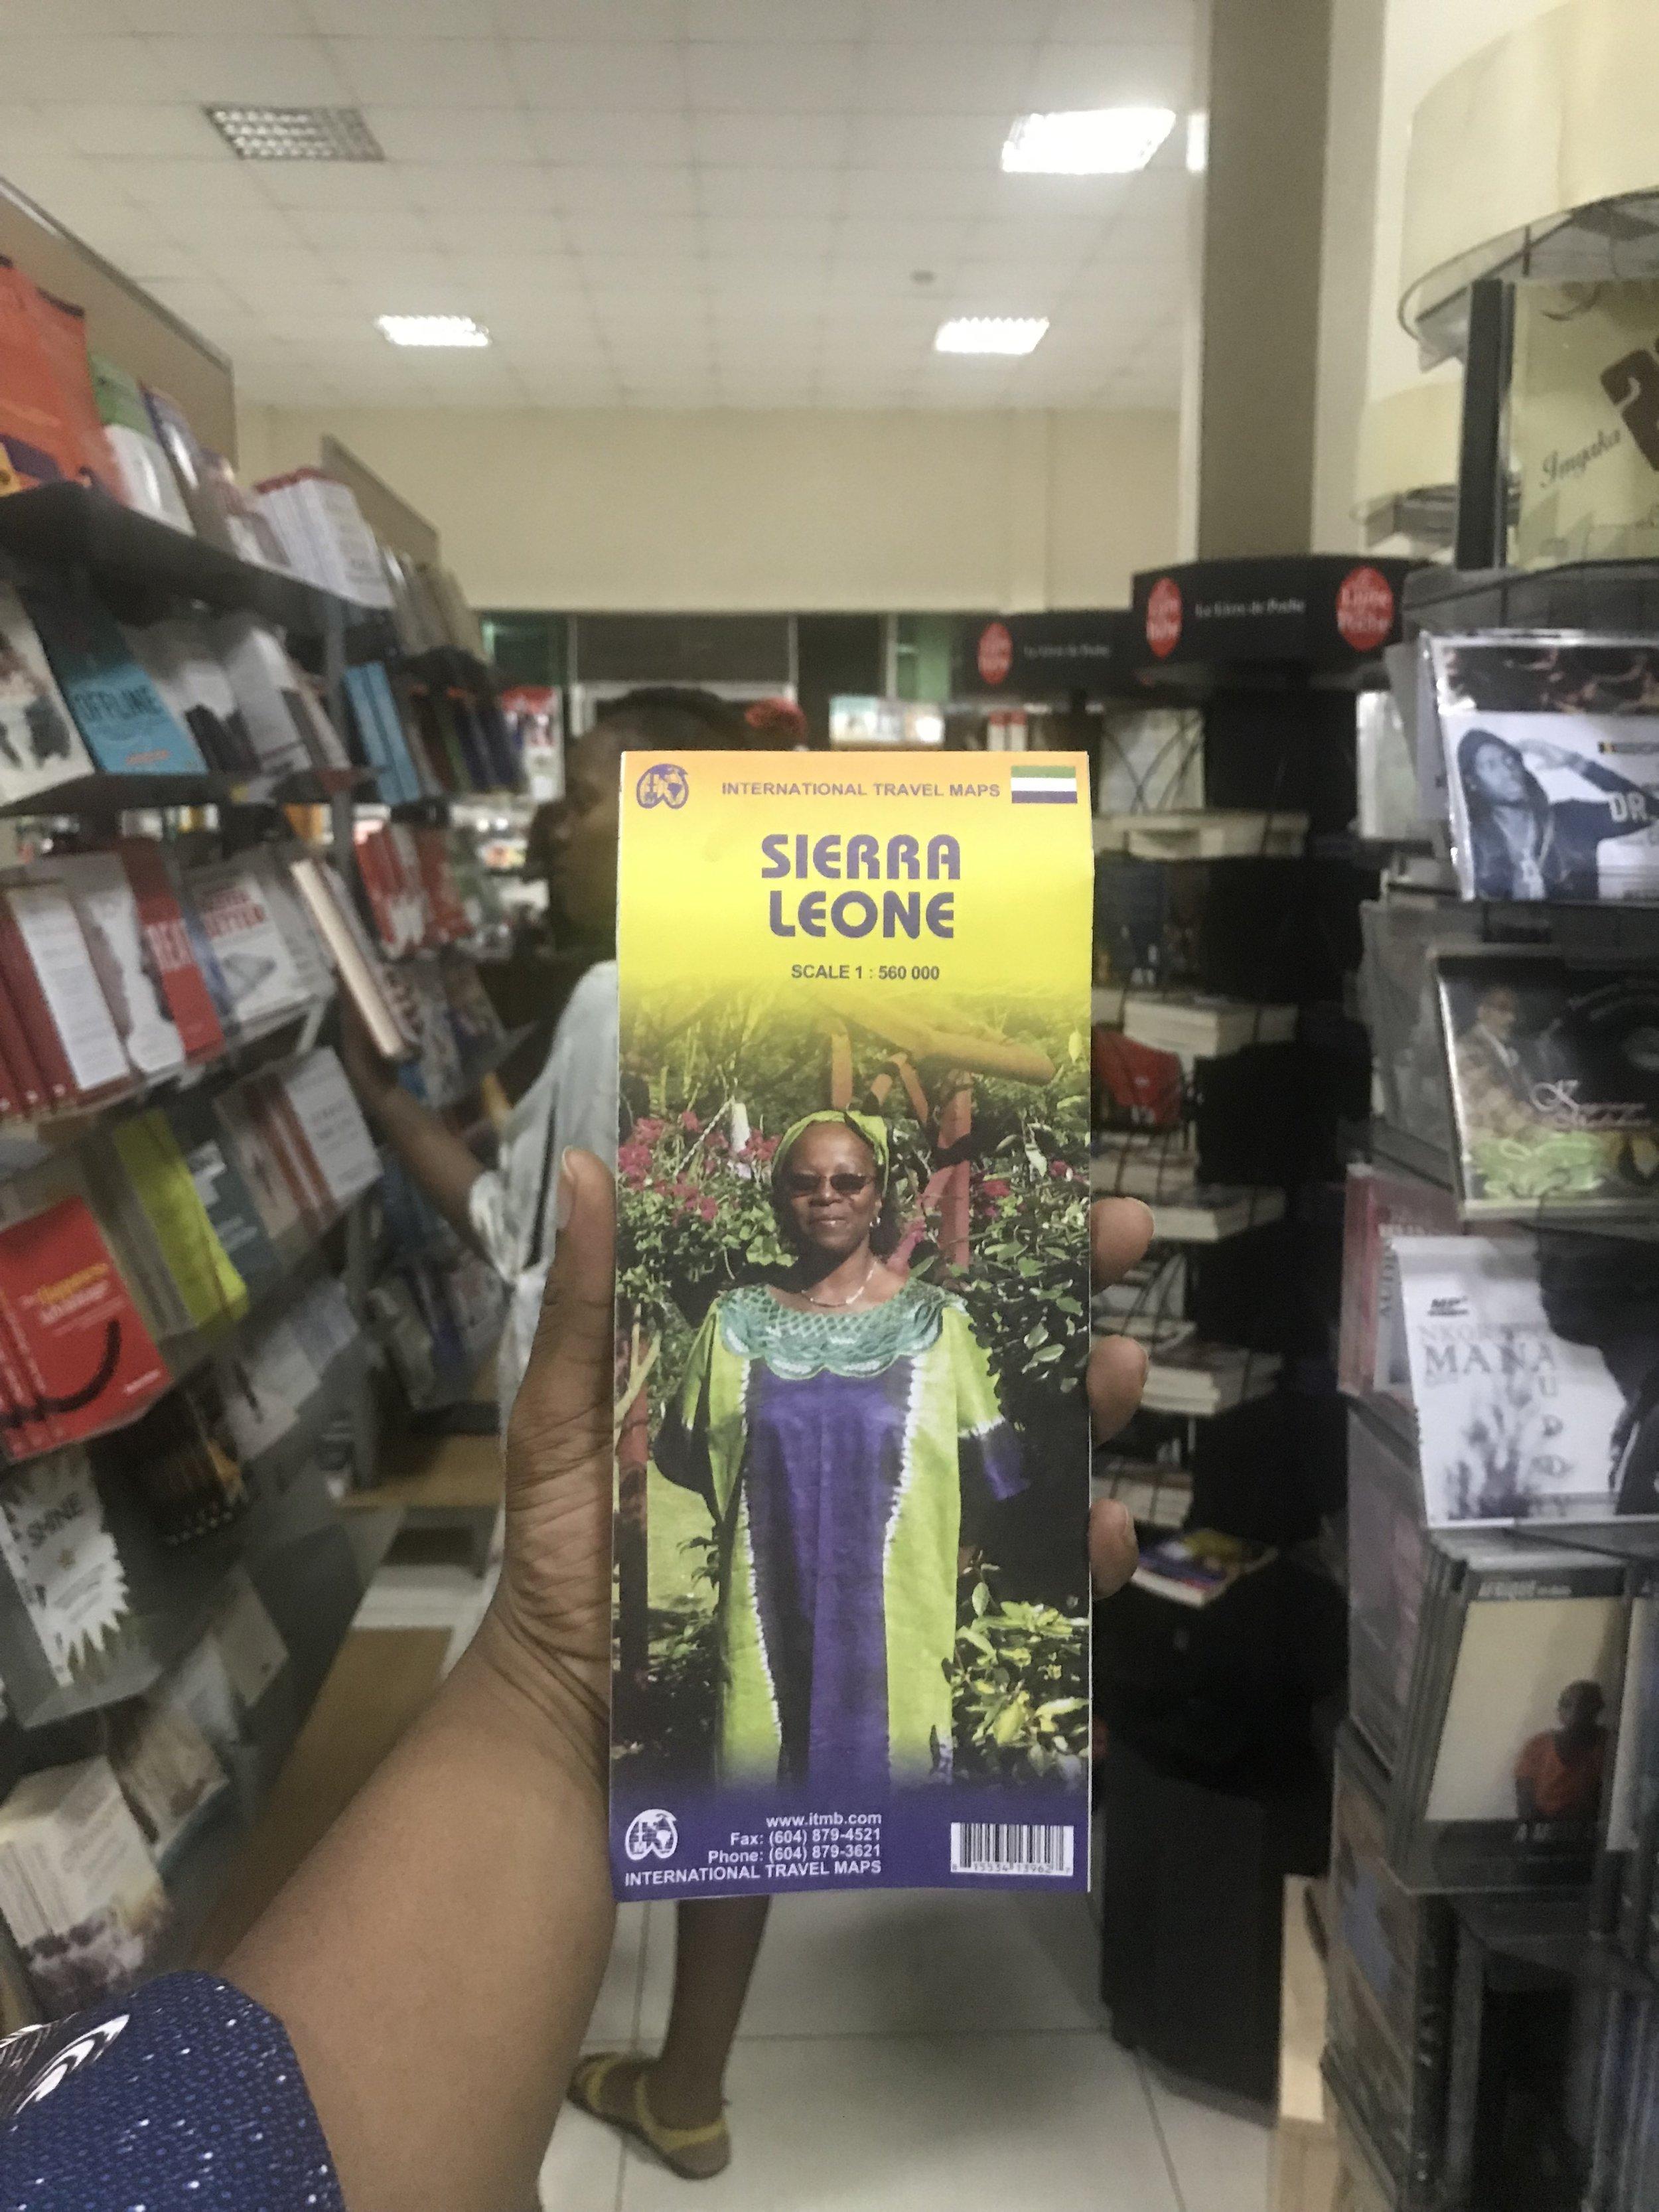 IMG_6209 2VickieRemoe-travel-kigali-rwanda-review-kwibohora25-hotels-africa.JPG